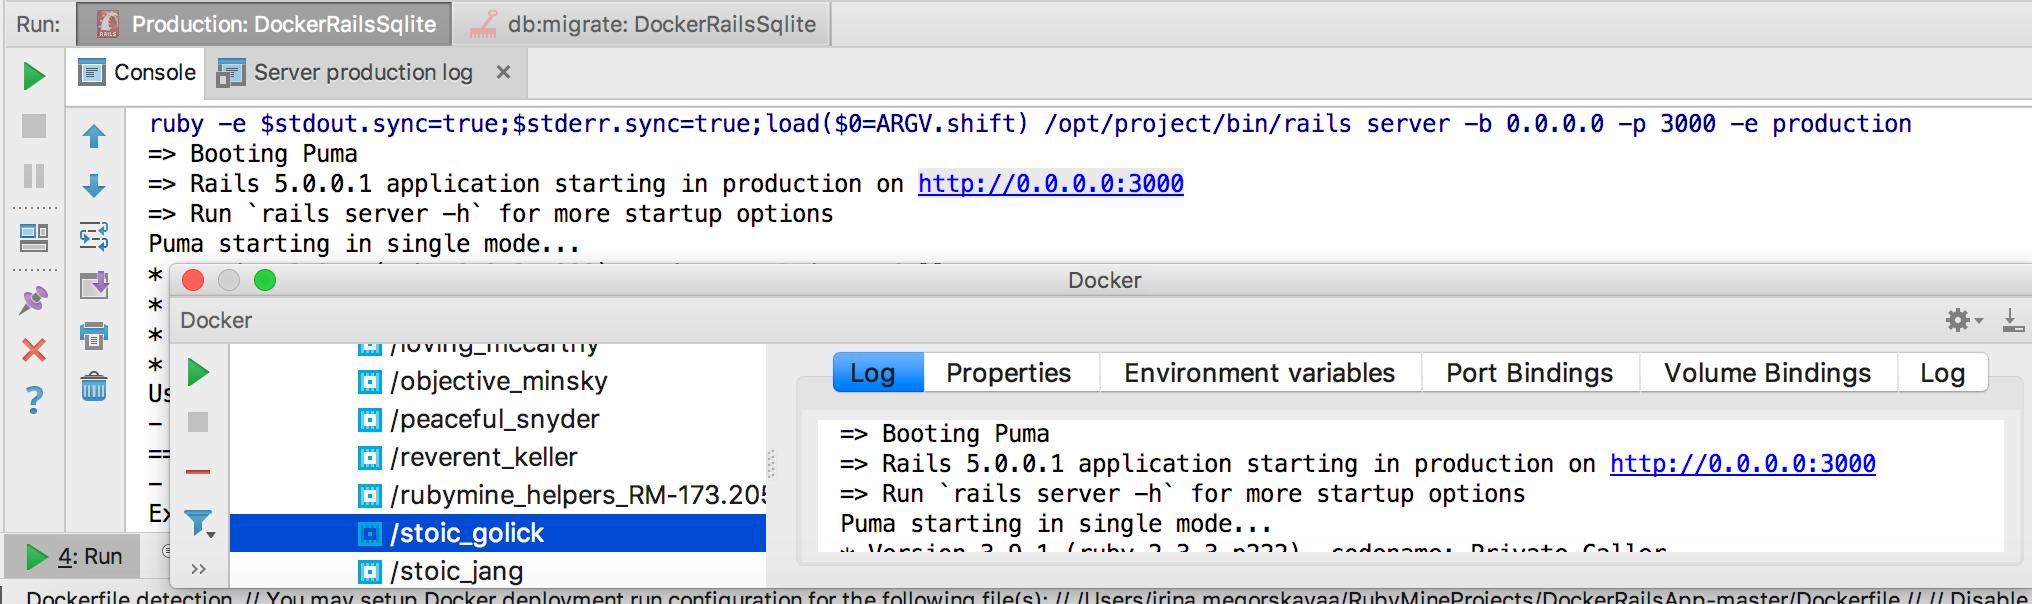 rm correspondence between docker and run tool window